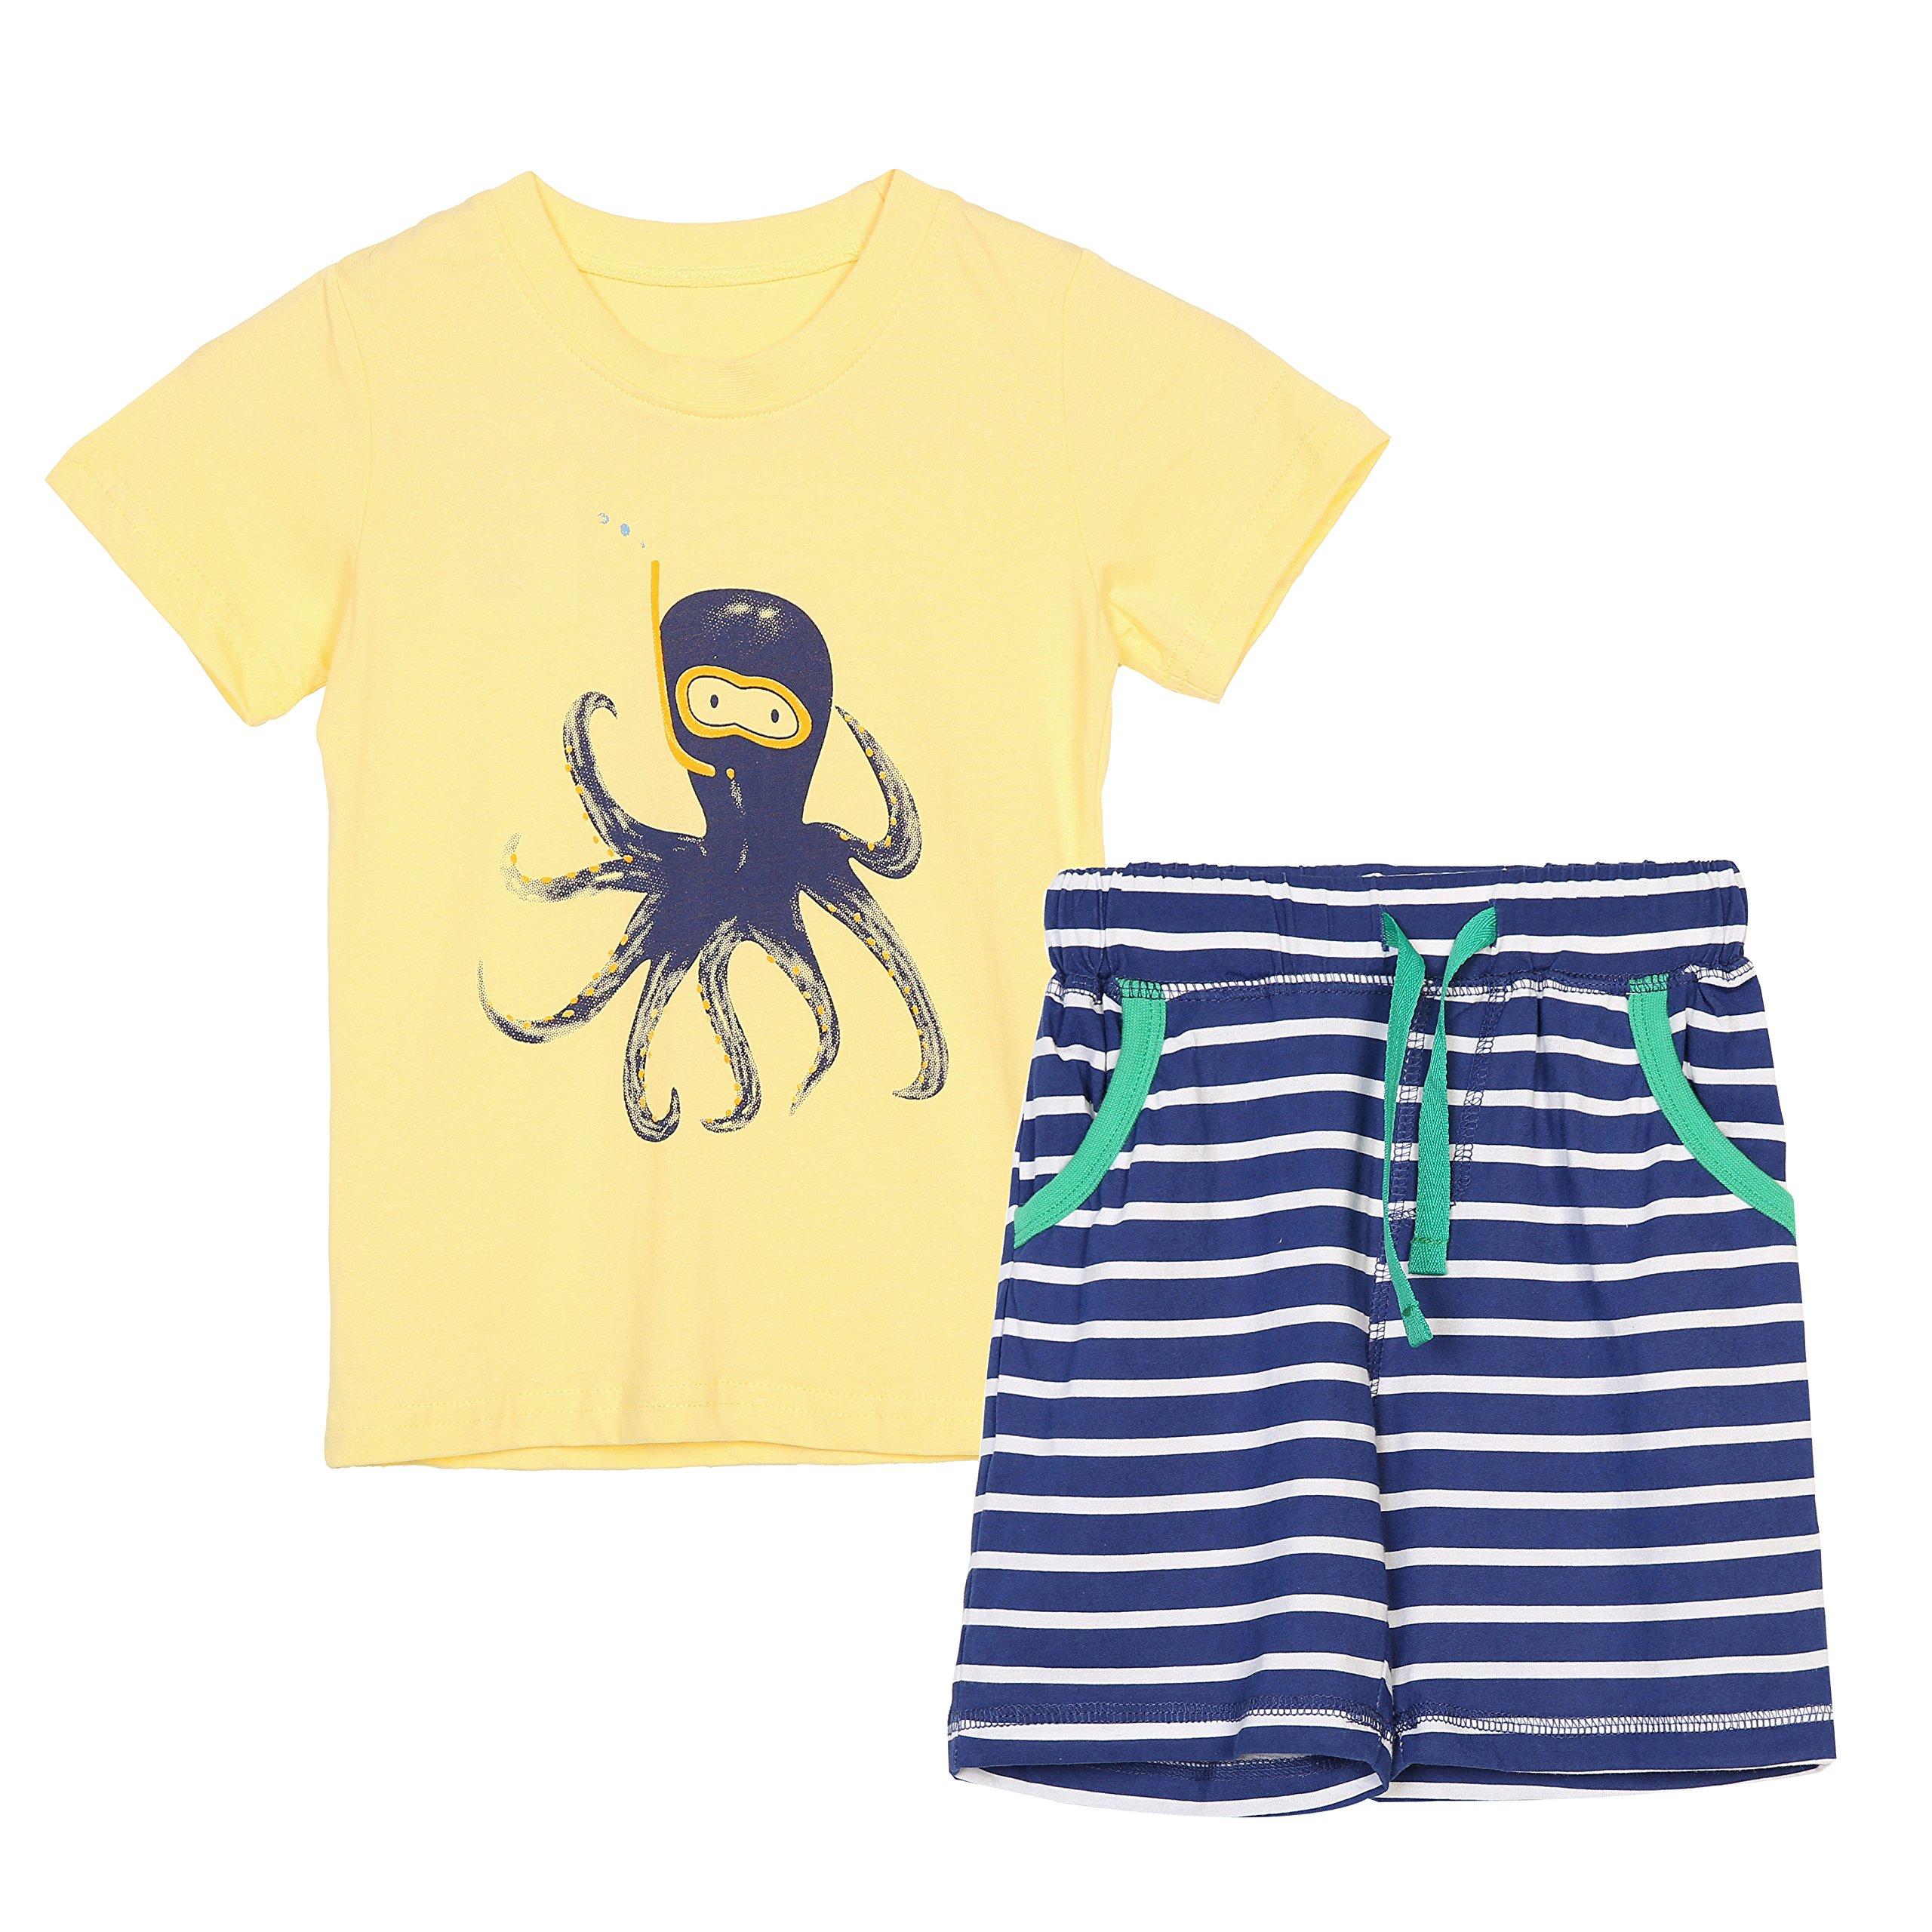 HowJoJo Boys Summer Cotton Short Sets Short Sleeve Graphic Print T-Shirts + Striped Shorts Yellow 3T